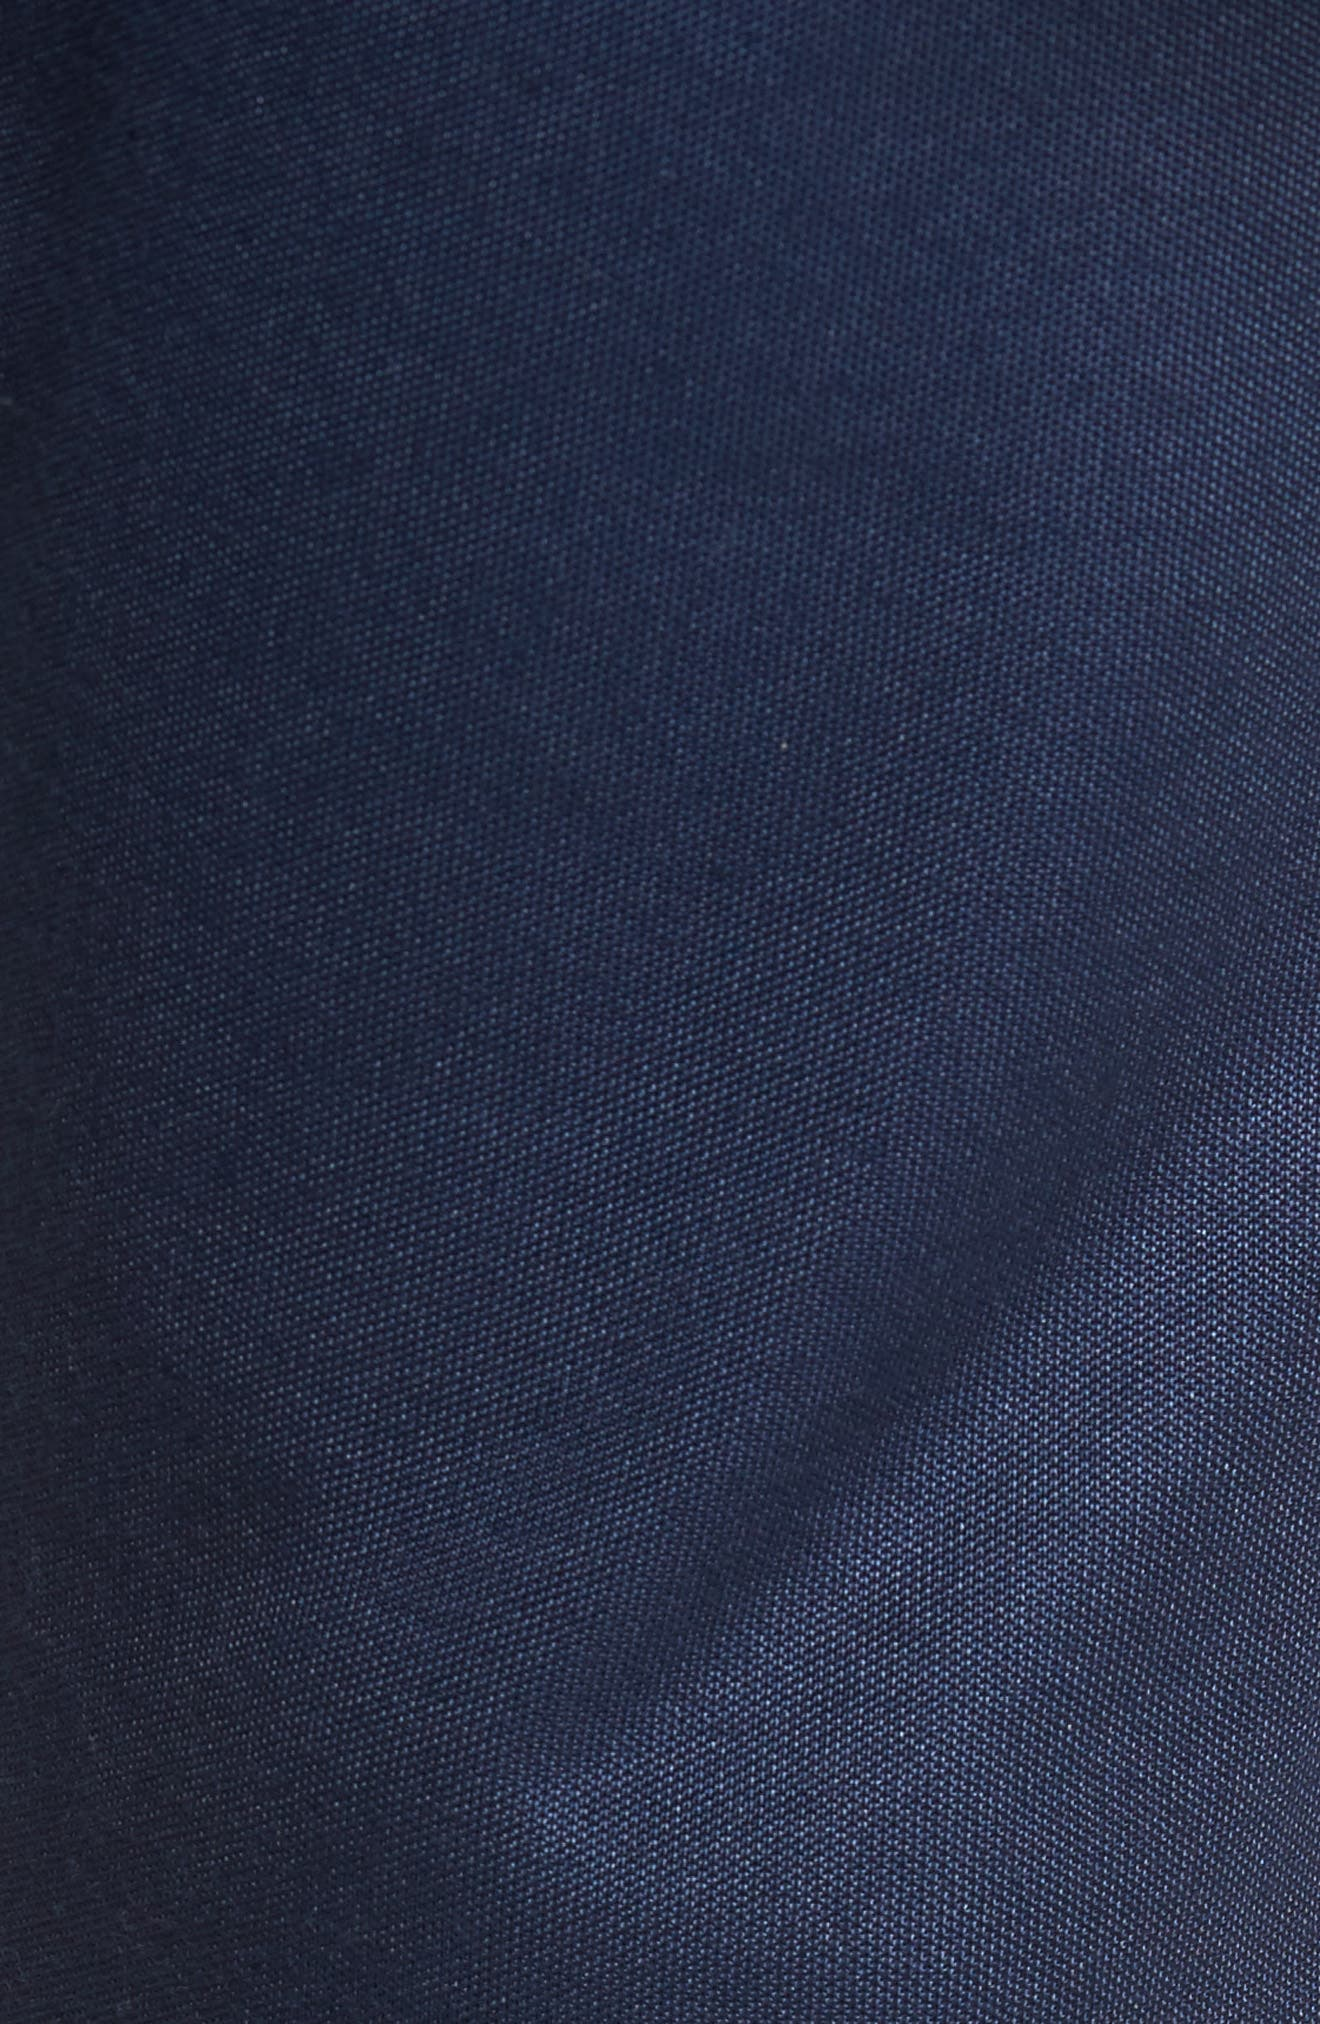 Bianchi Pants,                             Alternate thumbnail 10, color,